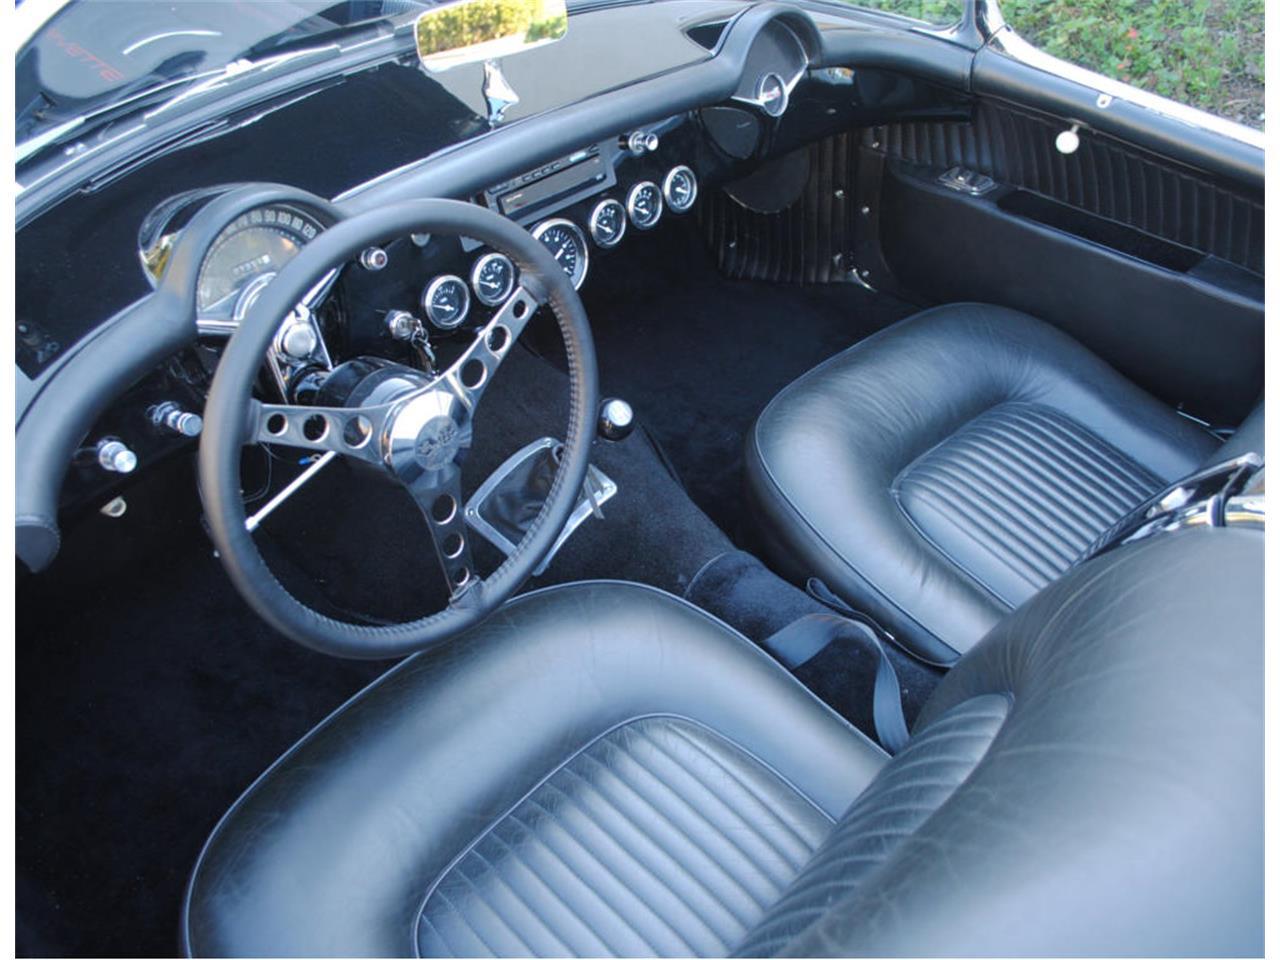 Large Picture of Classic 1954 Corvette located in Costa Mesa California - $110,000.00 - LBC0